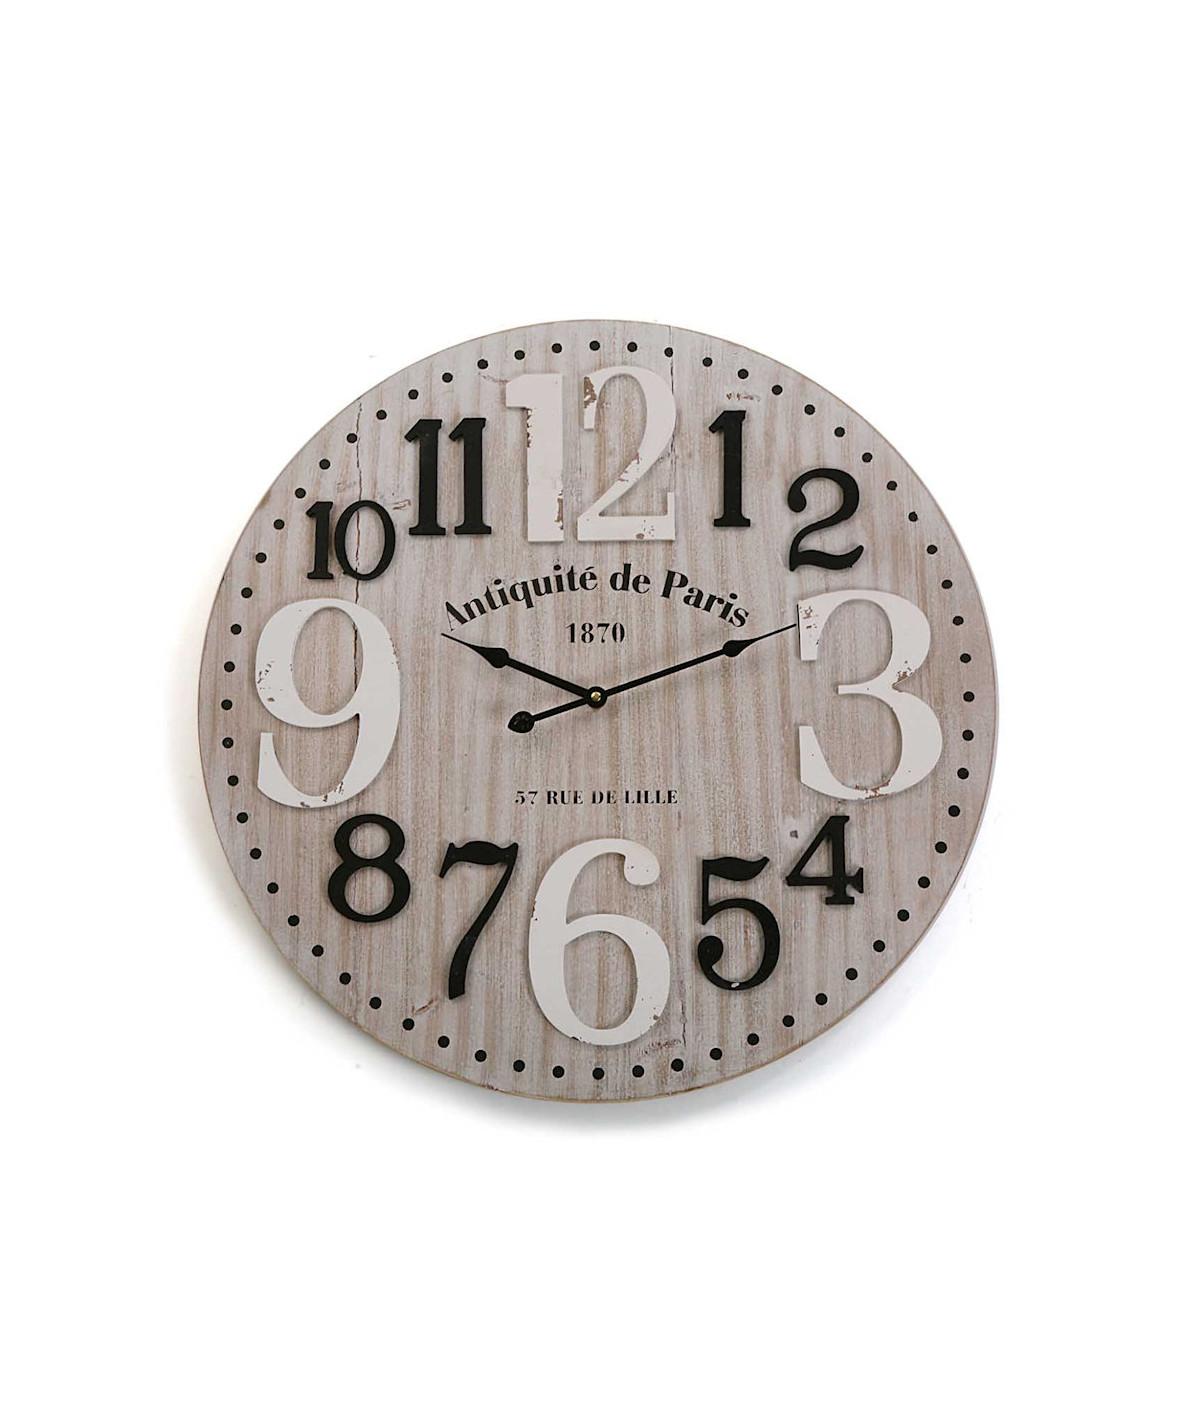 Horloge murale ronde bois Diam60cm - Madison |YESDEKO